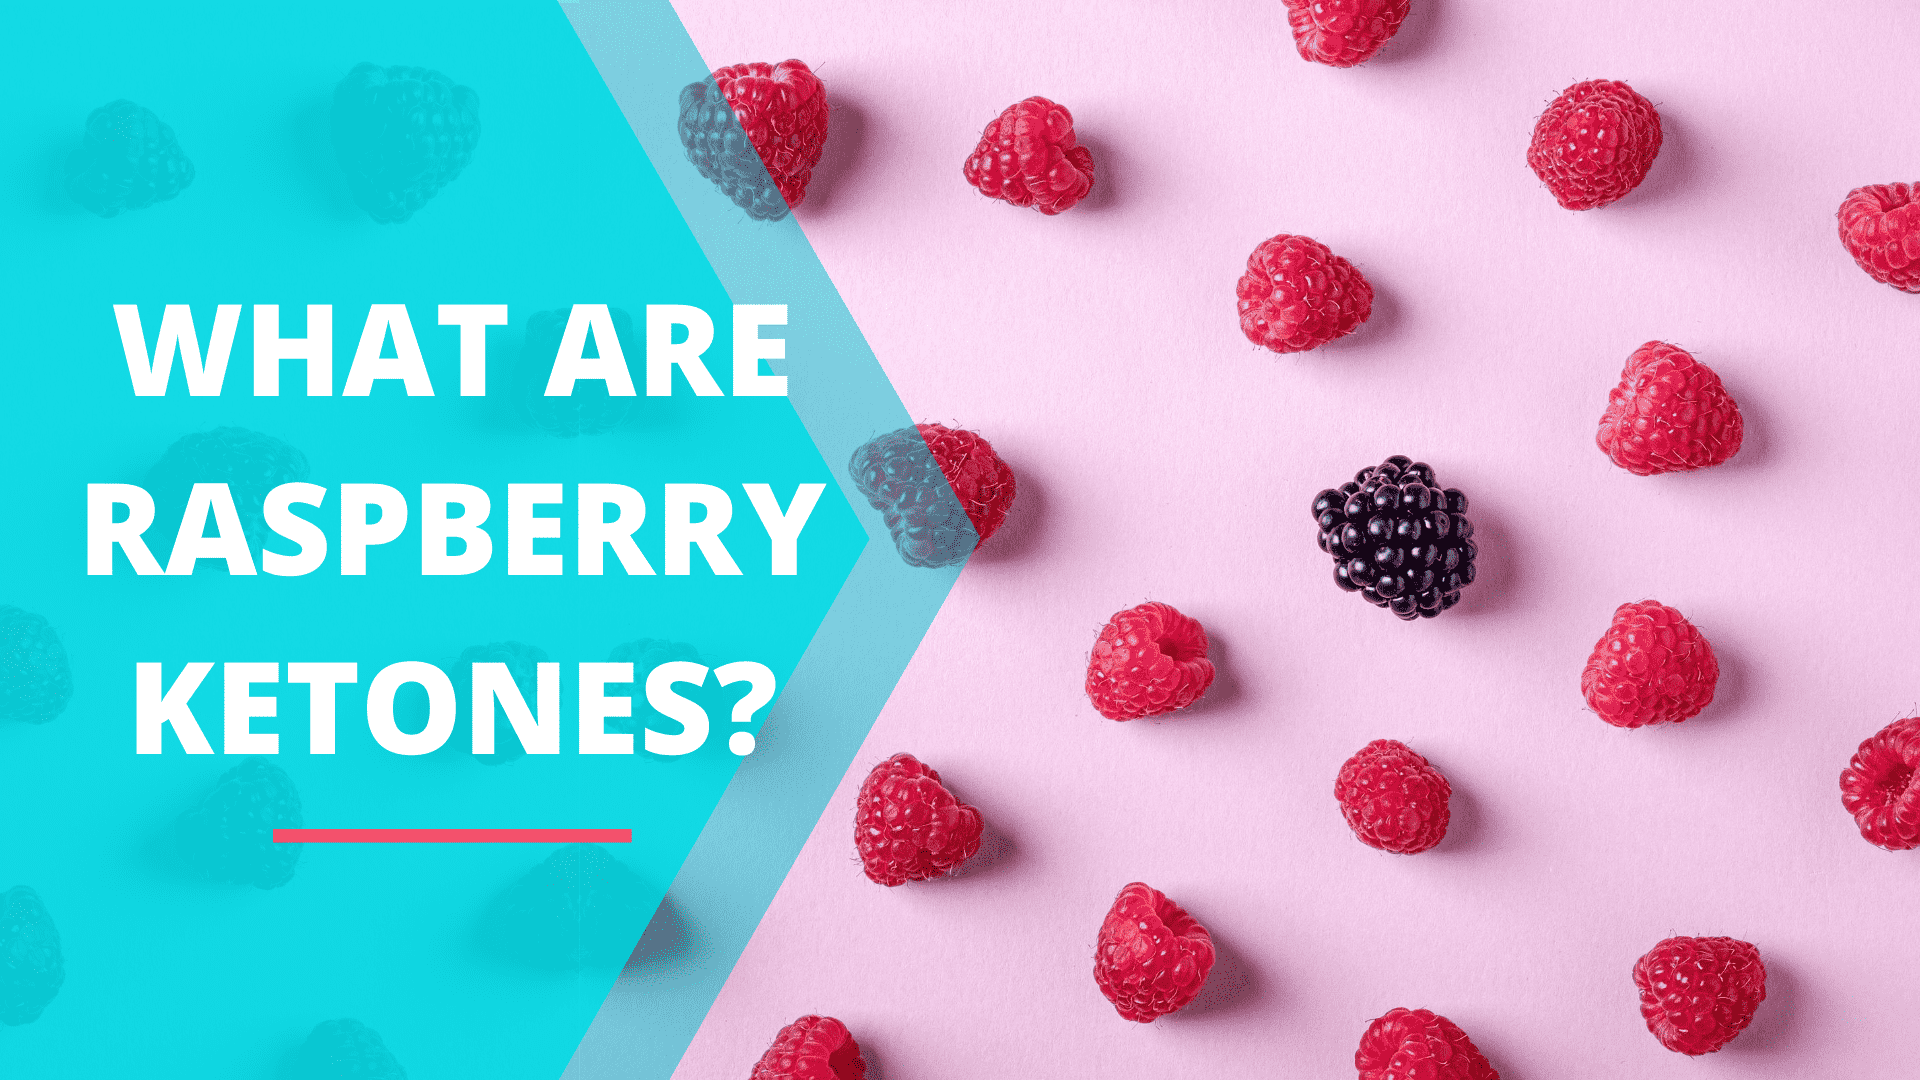 What Are Raspberry Ketones?